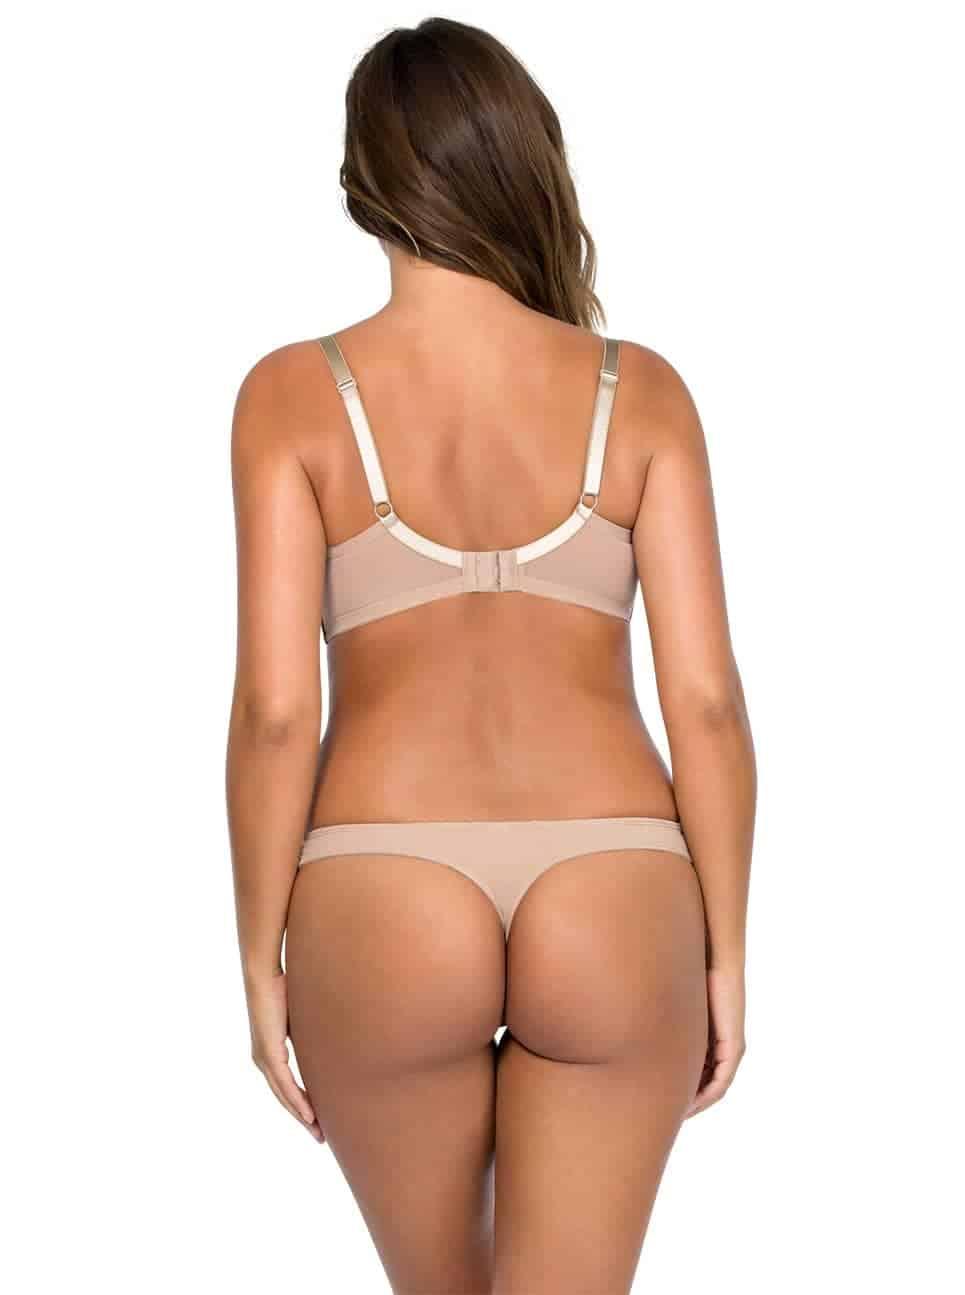 Jeanie PlungeMoldedBra4801 Thong4804 Enude Back - Jeanie Plunge Molded Bra - European Nude - 4801